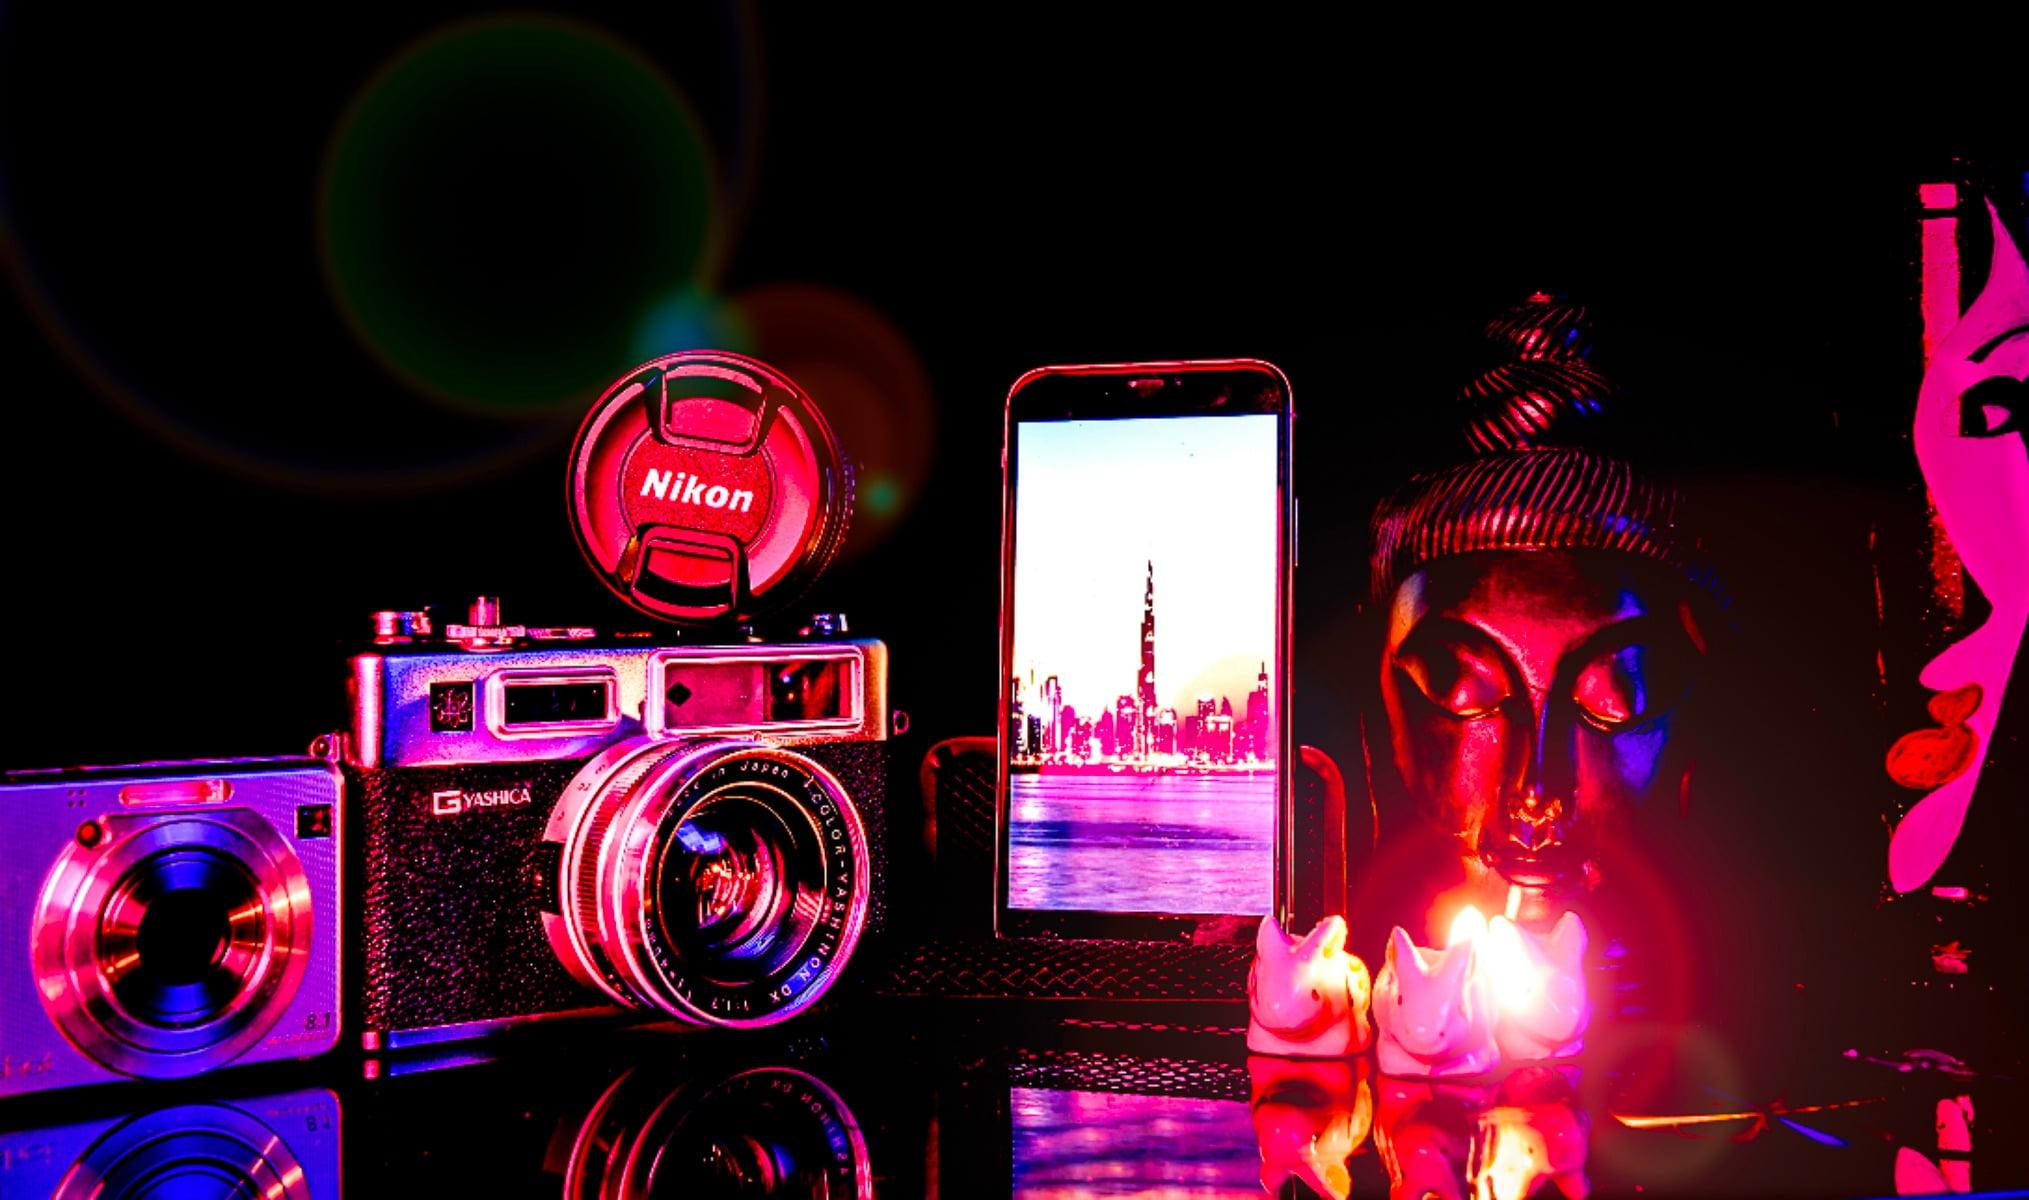 Cameras  optics, Communication Device, Mobile phone, Colorfulness, Electronics, Magenta, Technology, Red